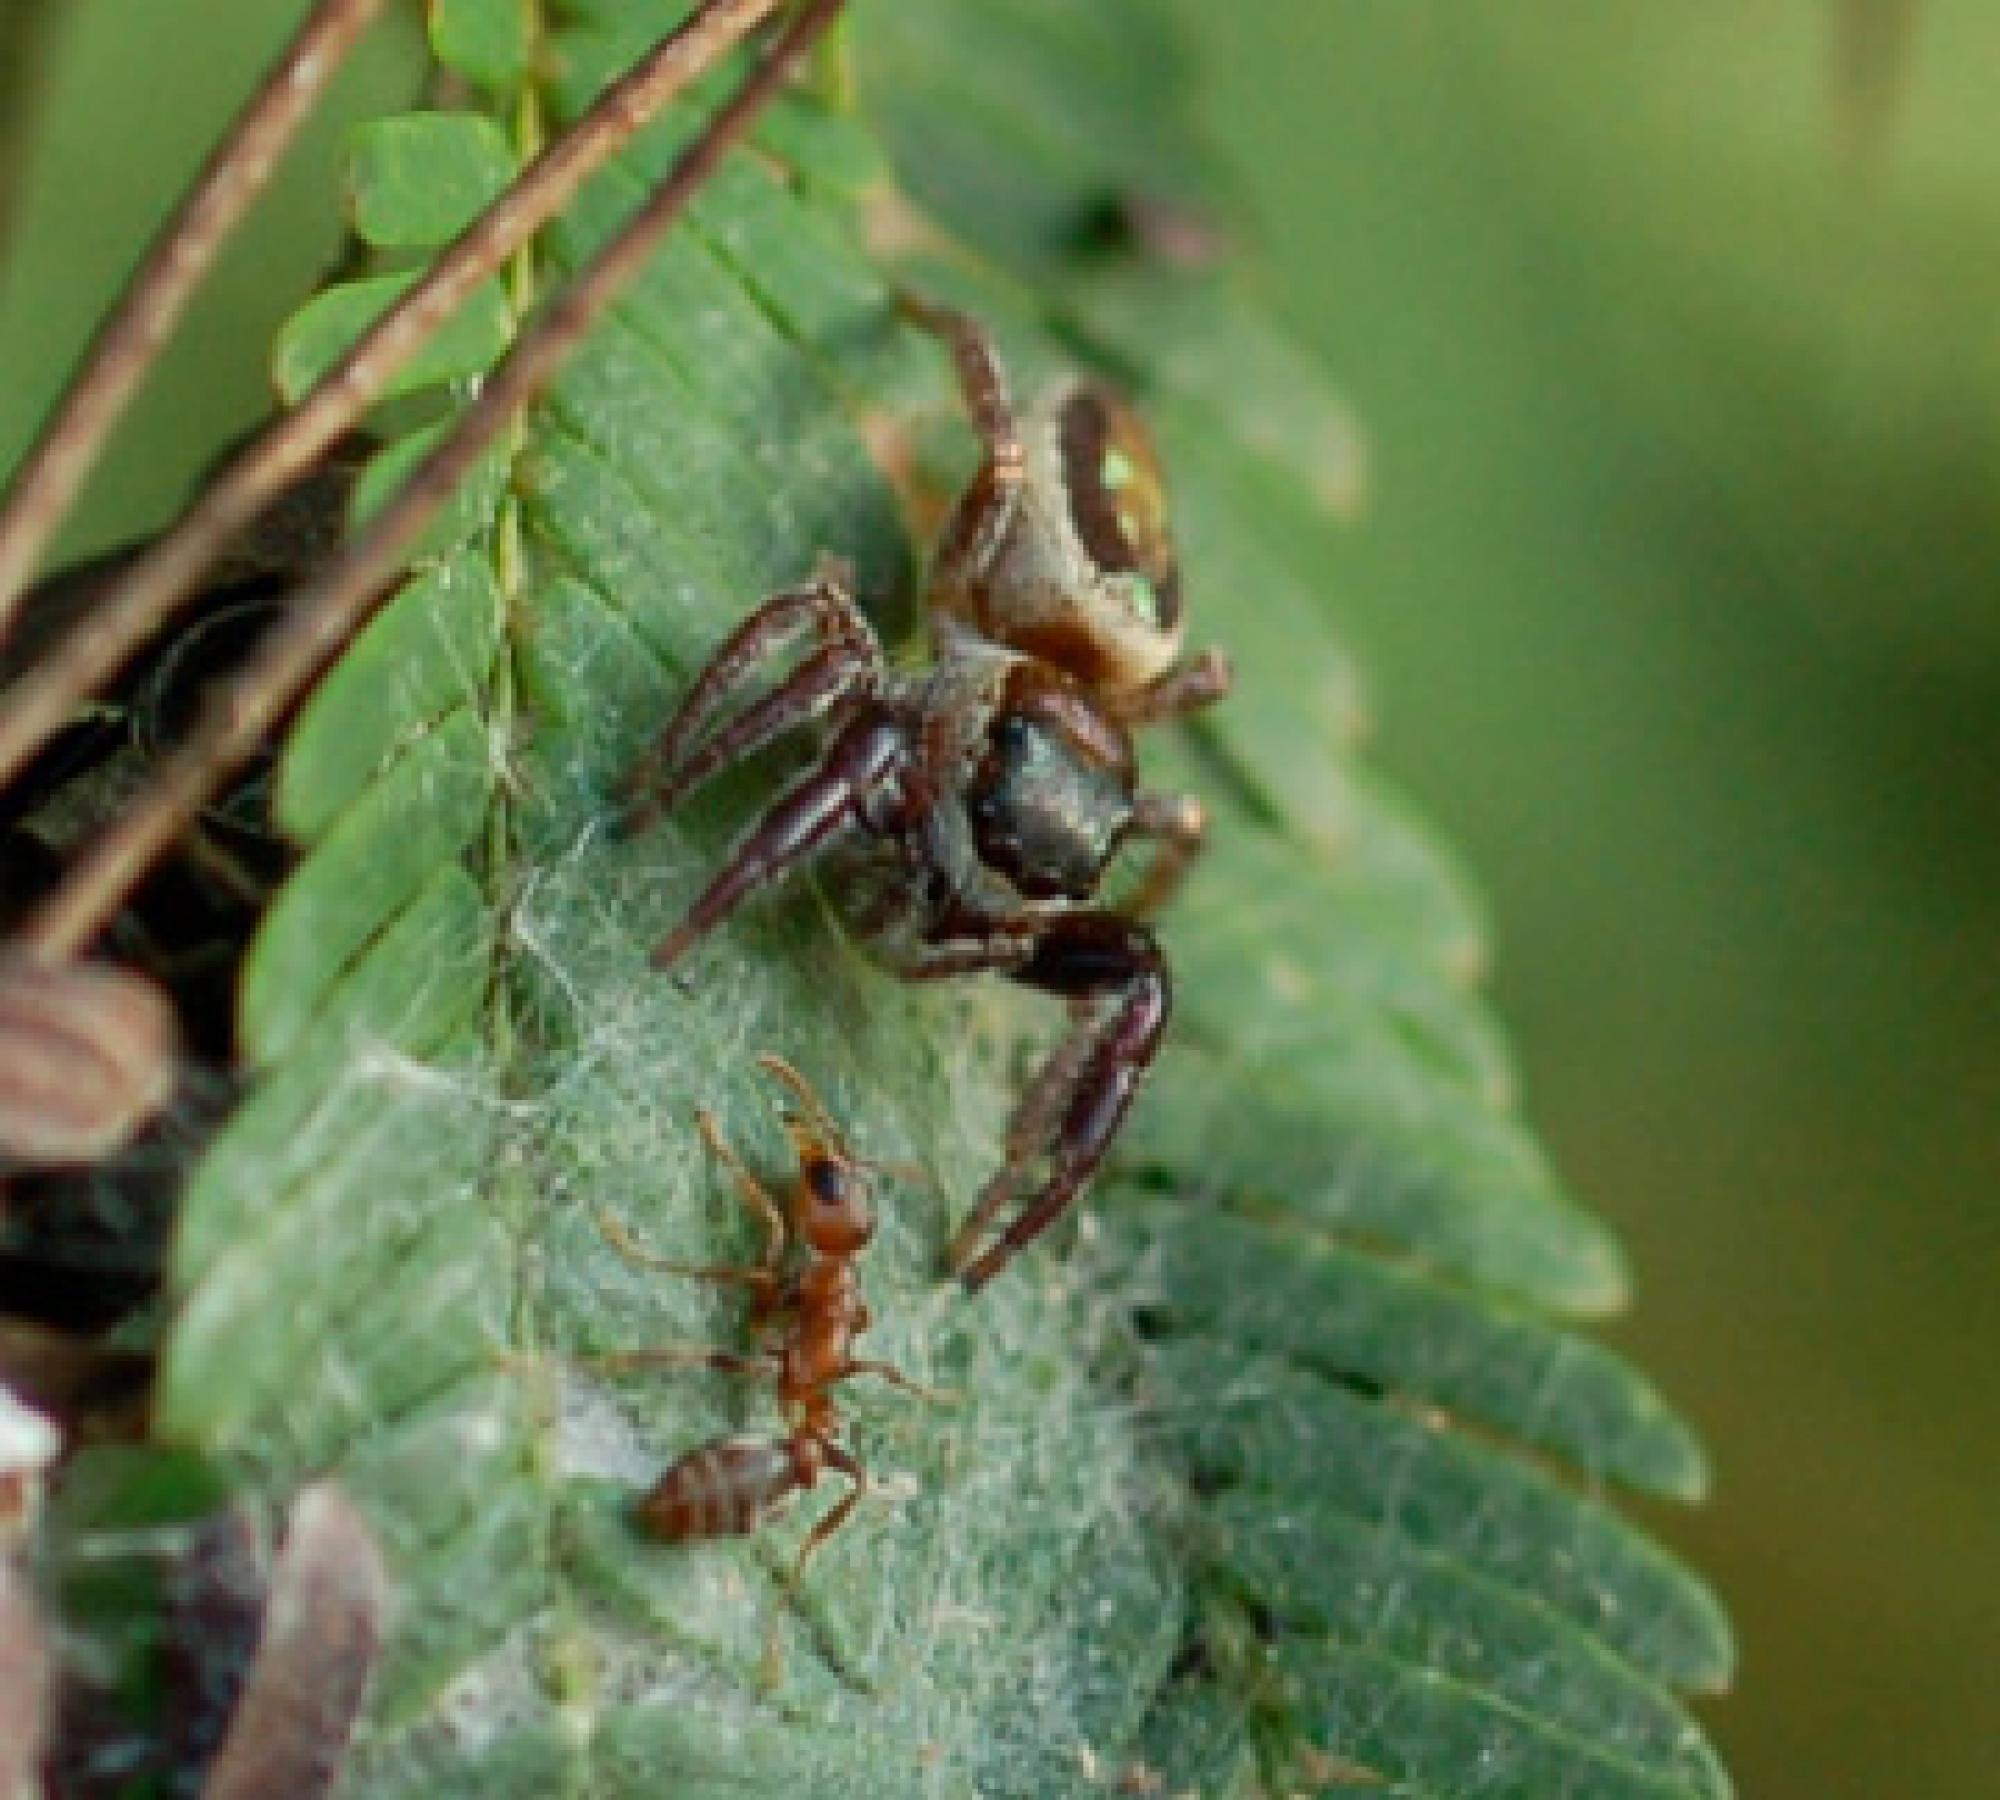 Adult female Bagheera kiplingi defends her nest against acacia-ant worker.